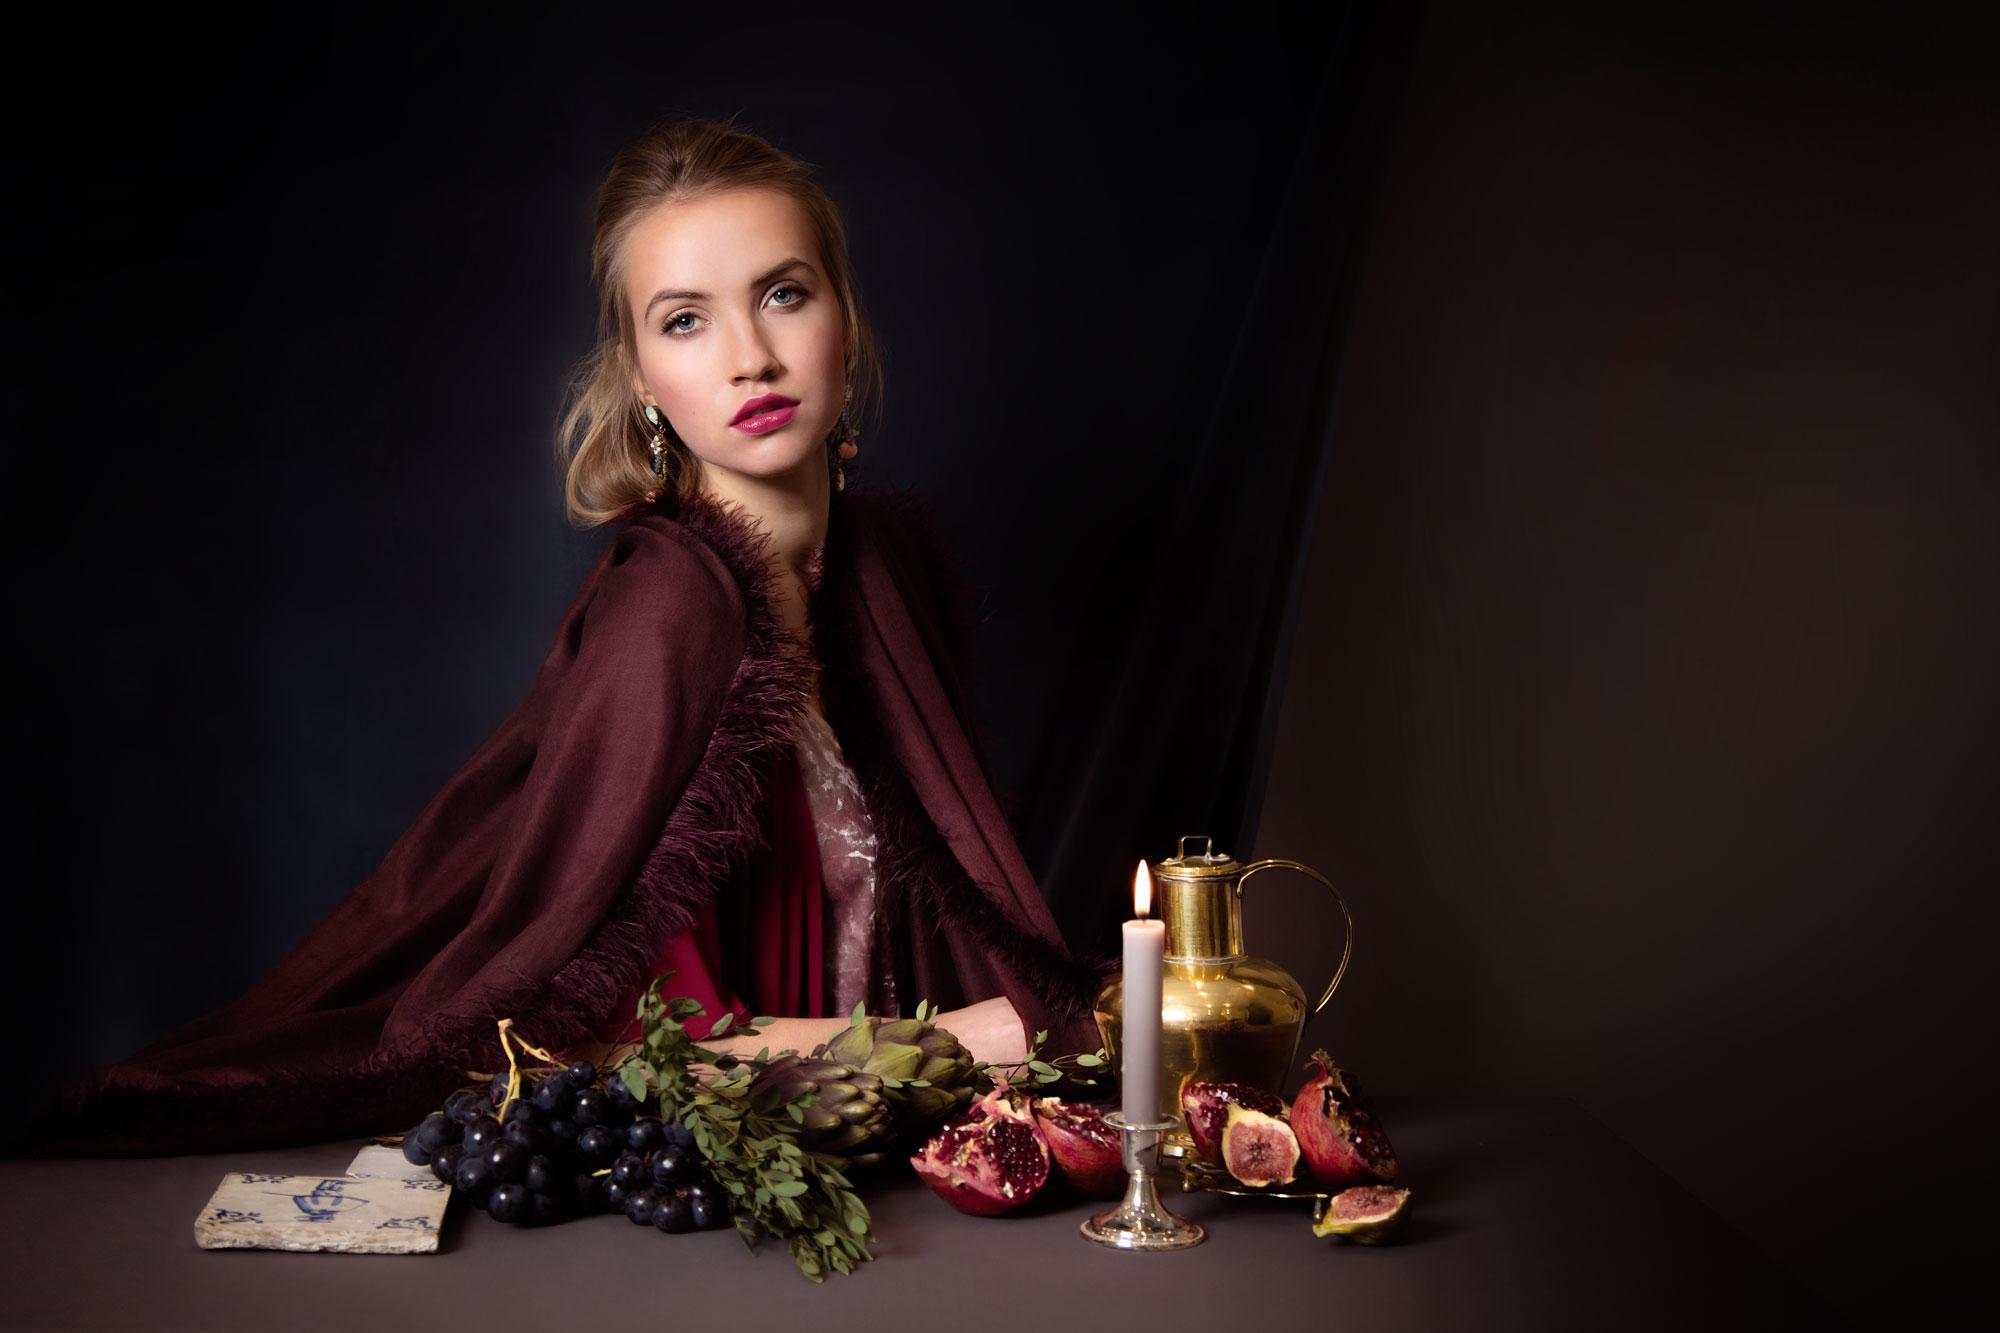 SHOT_FOTOGRAFIE_Katja_Schubert_munich_fashion_feneun_hw17_01